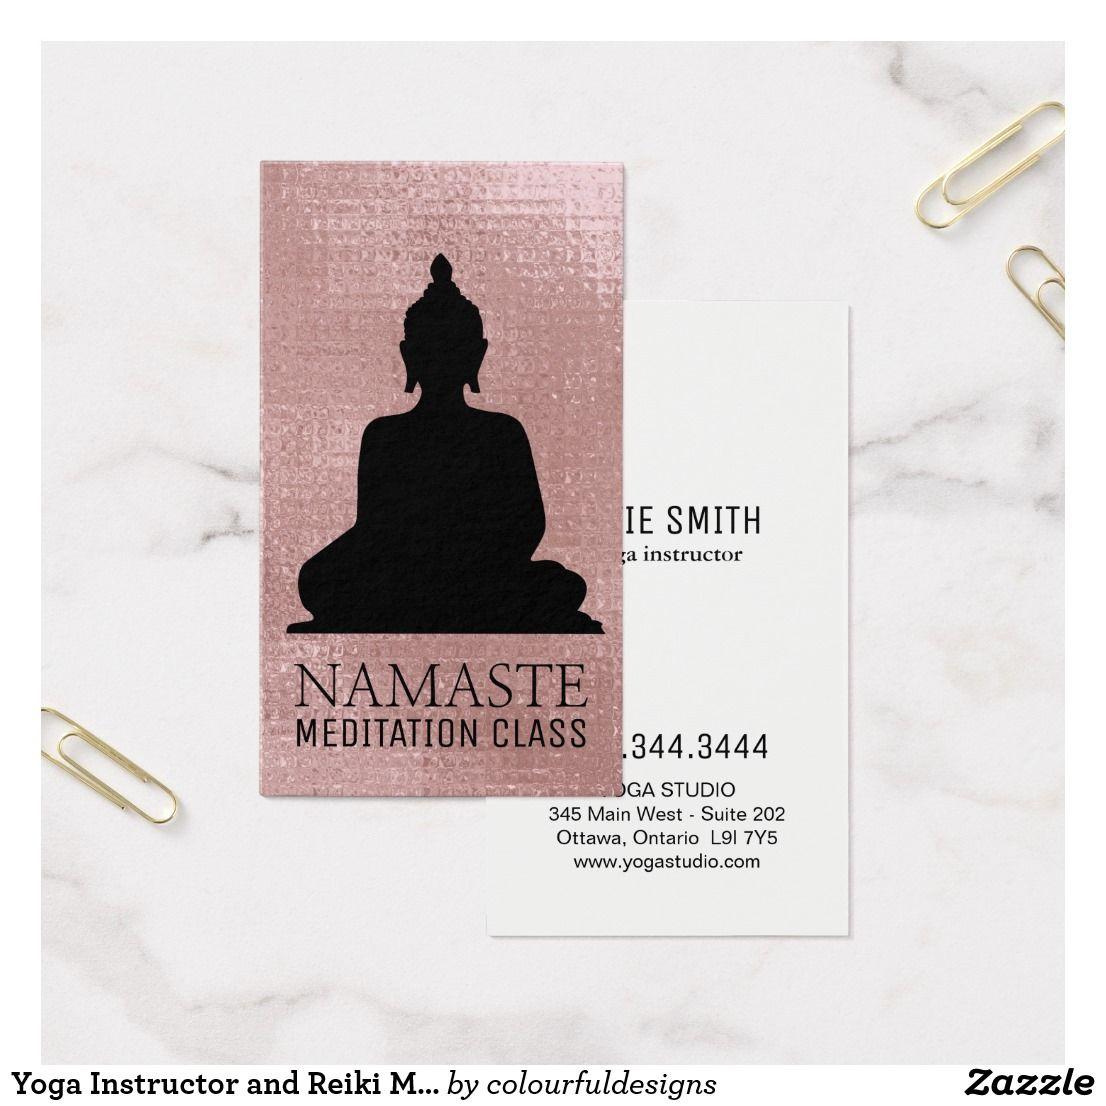 Yoga Instructor and Reiki Master Business Cards | Yoga